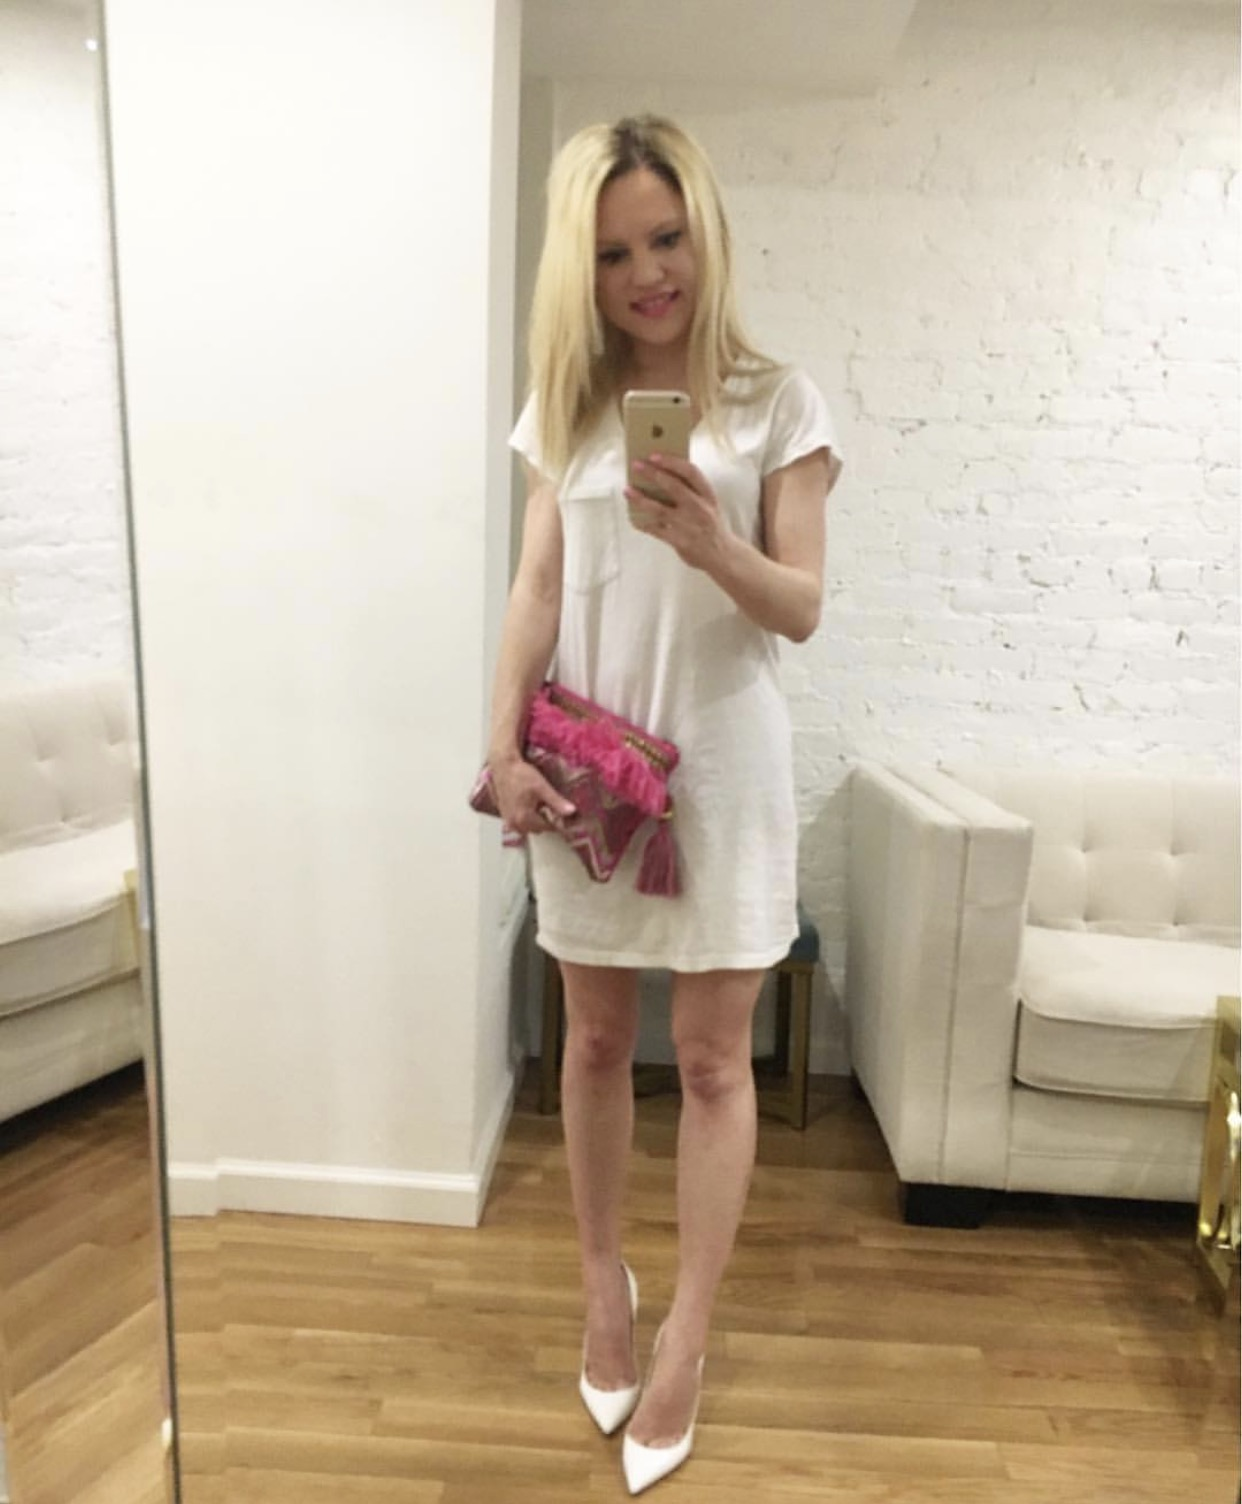 white t-shirt dress, pink clutch